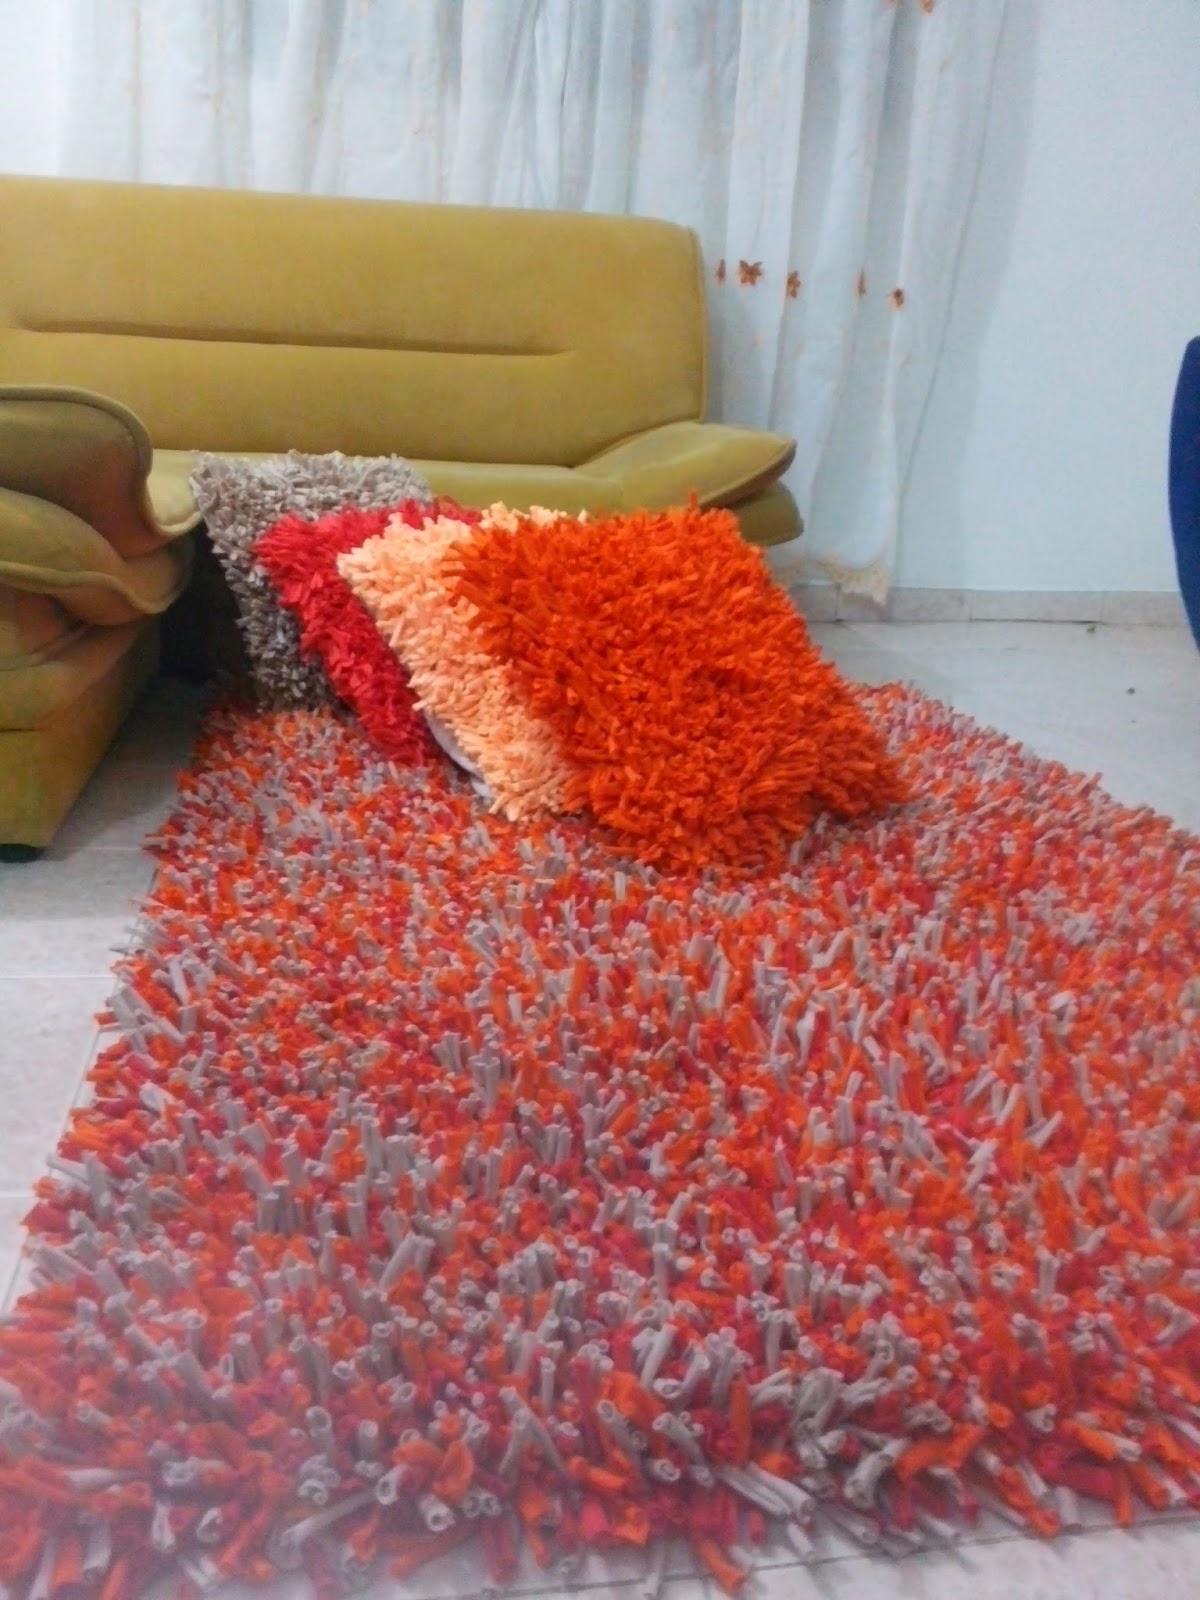 arte decoraci n manualidad y moda tapete y cojines